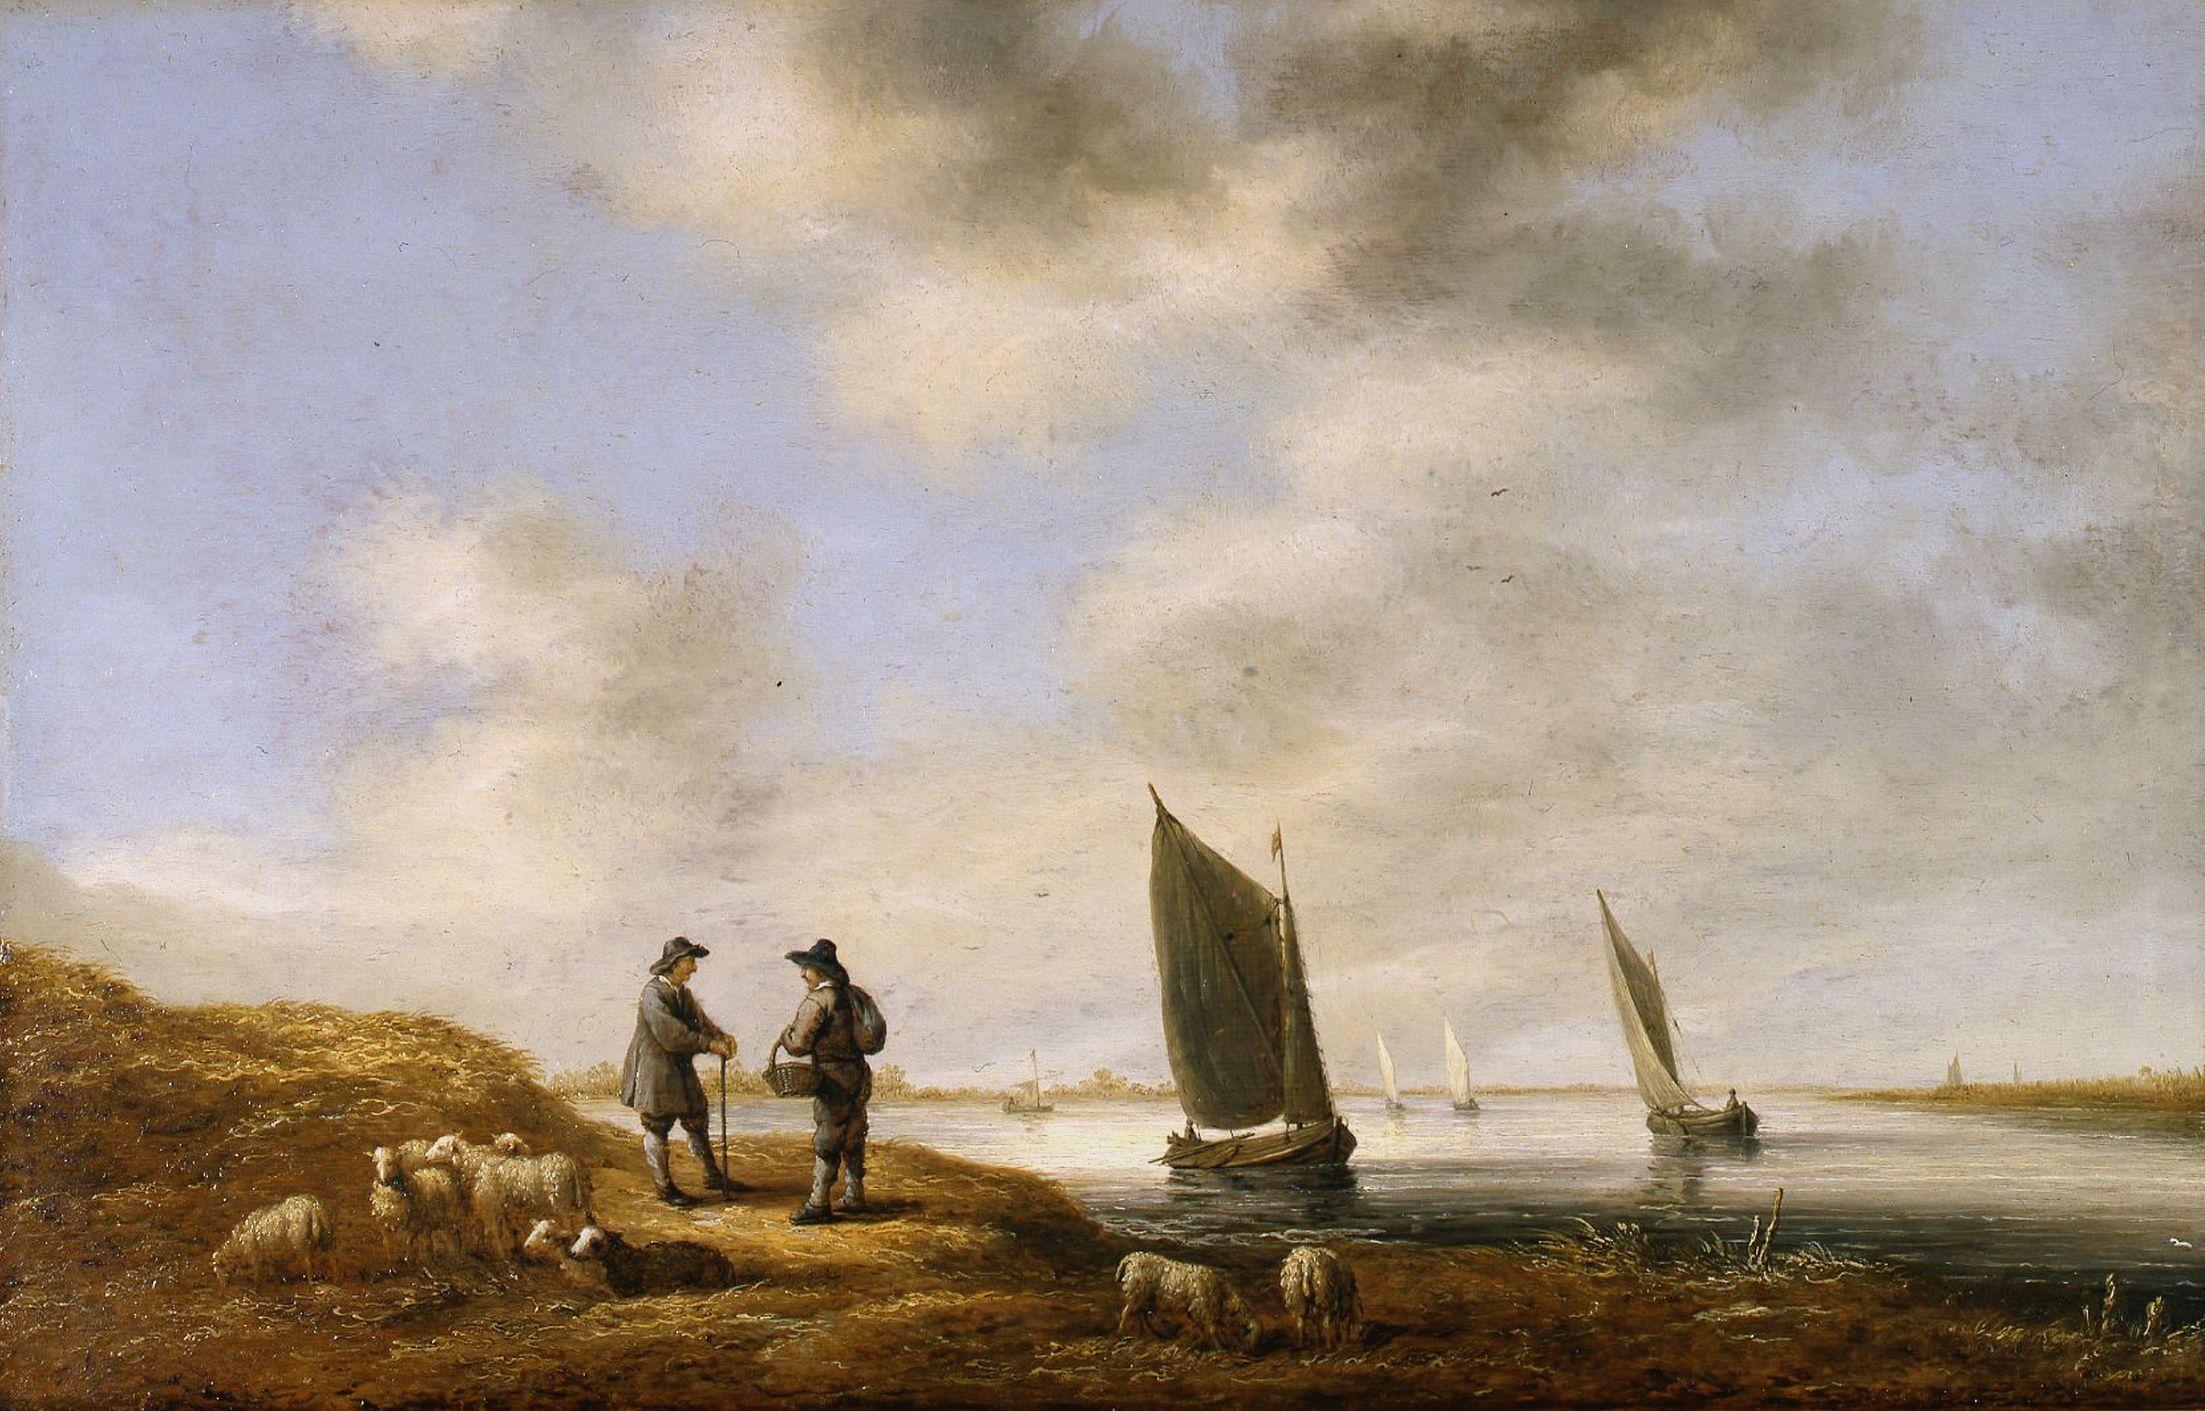 Речной пейзаж. 42х65, Музей Дордрехт. Aelbert Cuyp (1620-1691)